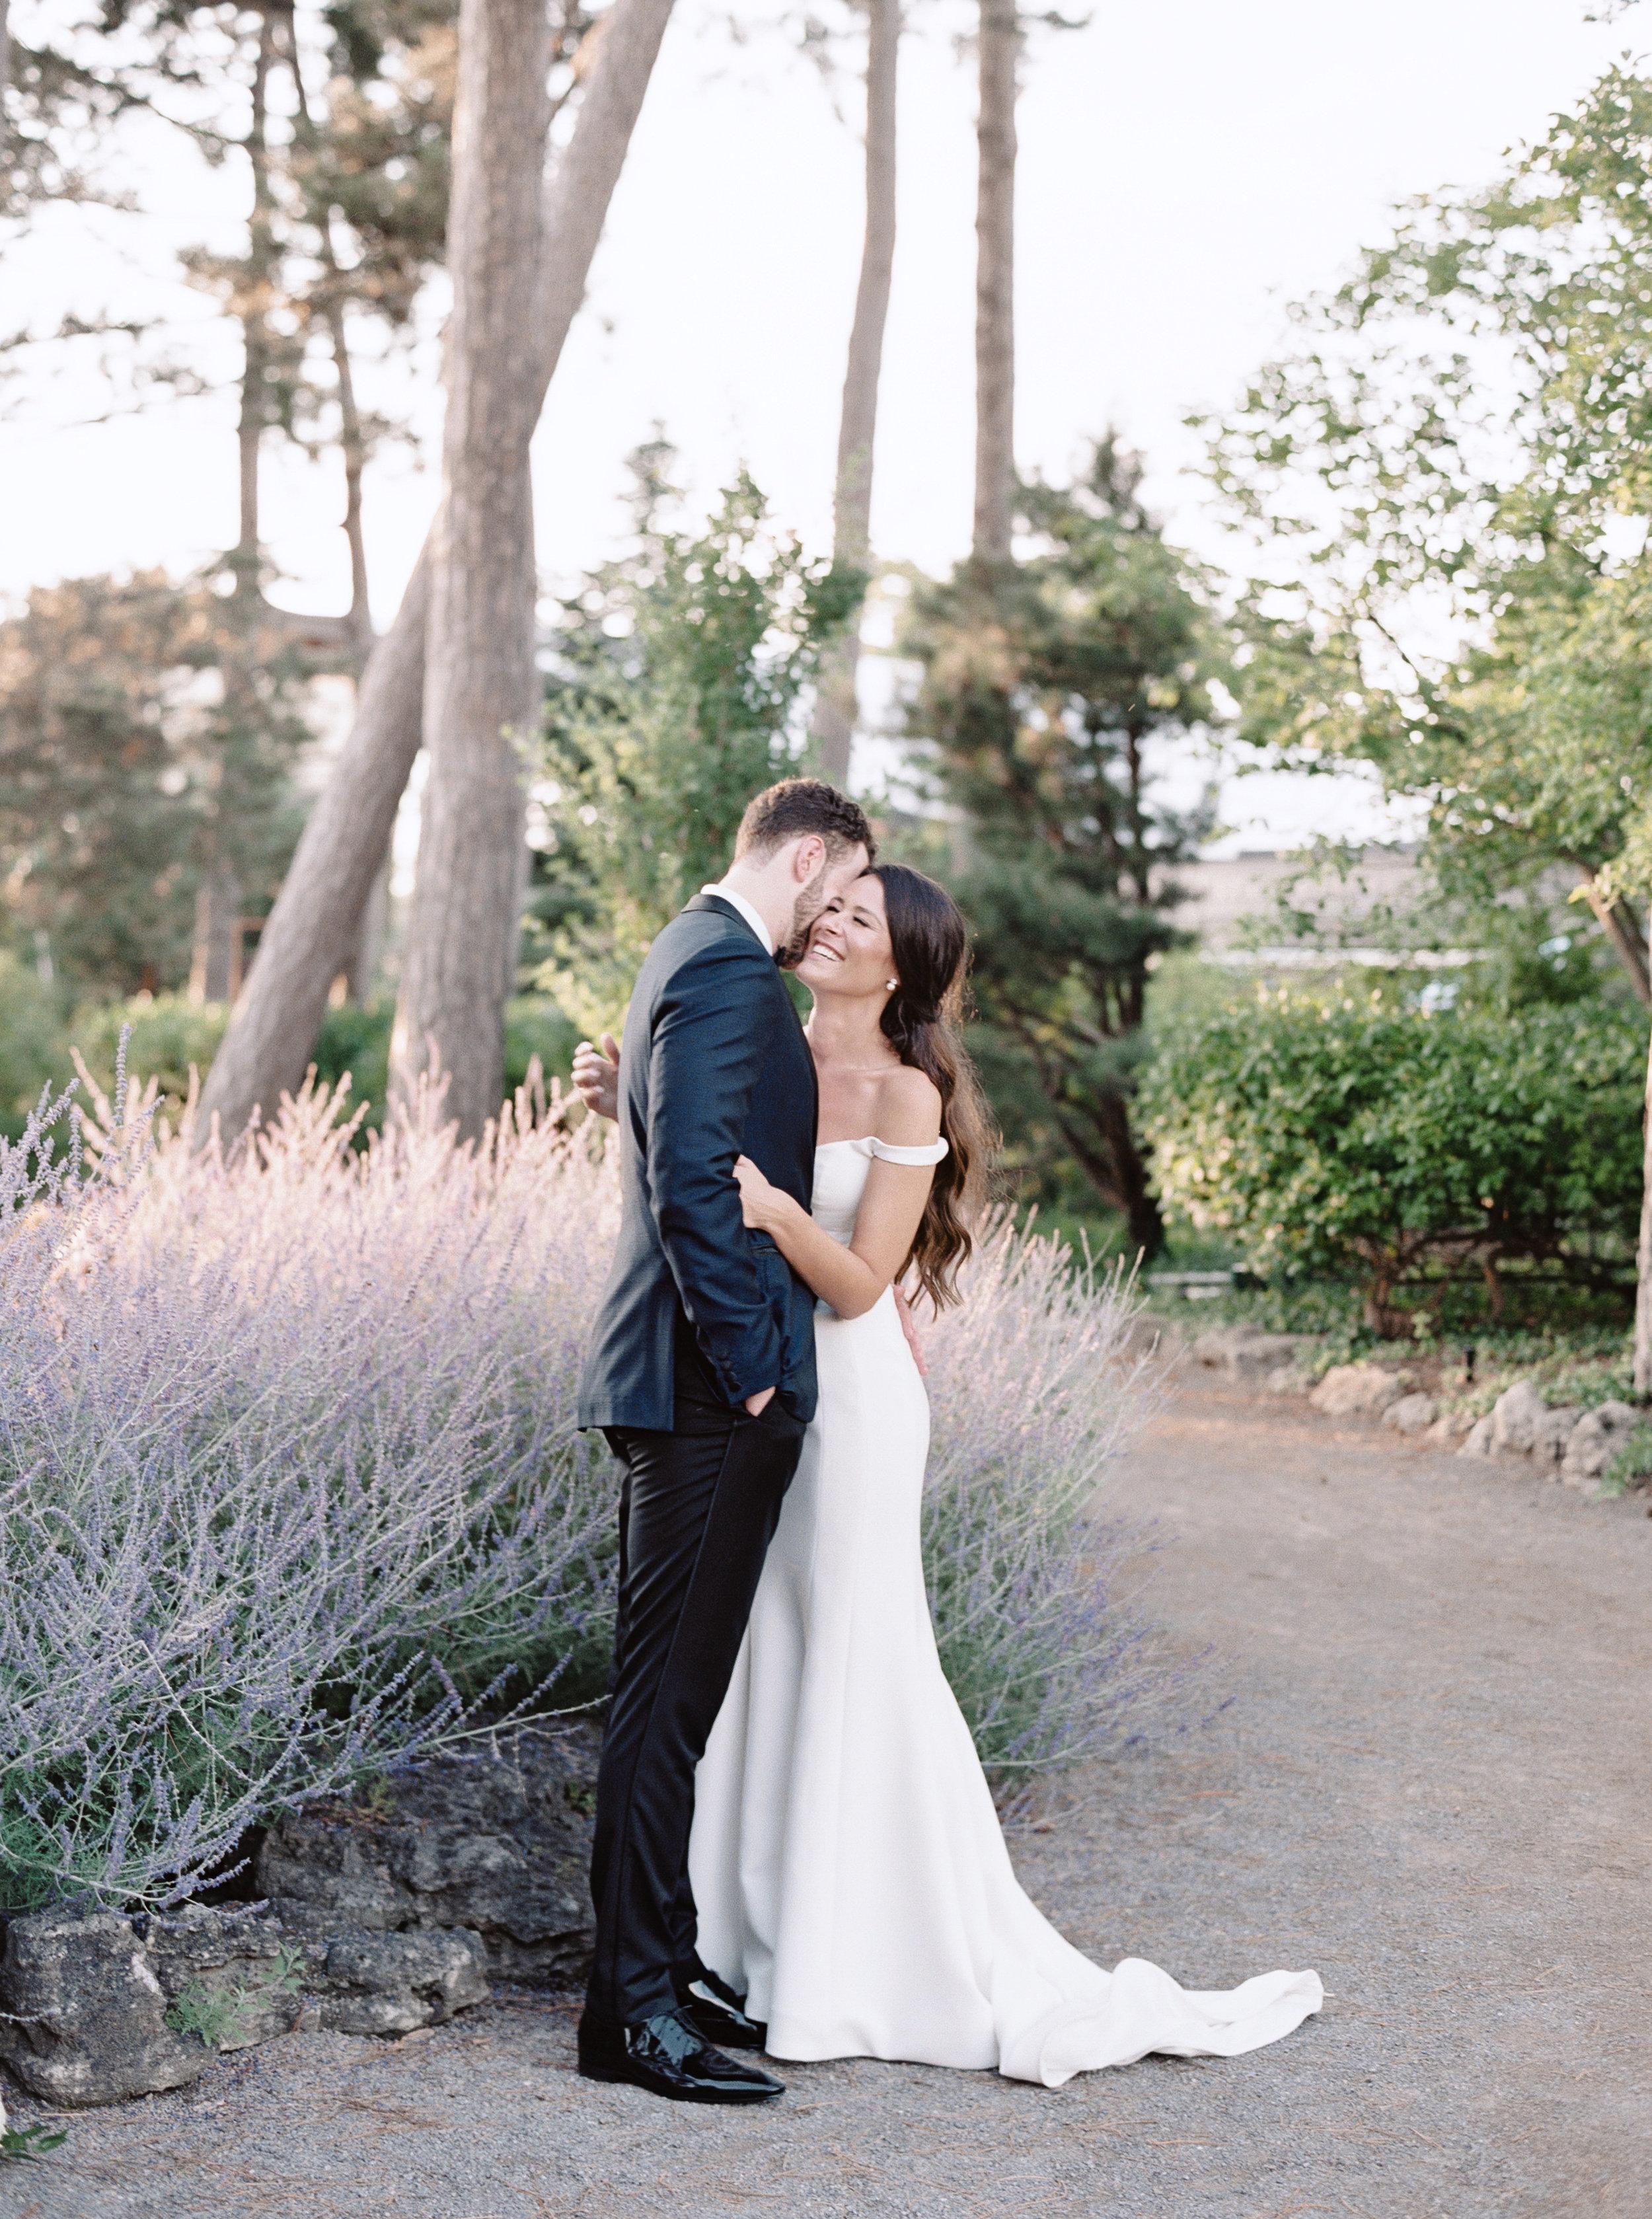 royal-botanical-gardens-burlington-toronto-wedding-photographer-2.jpg